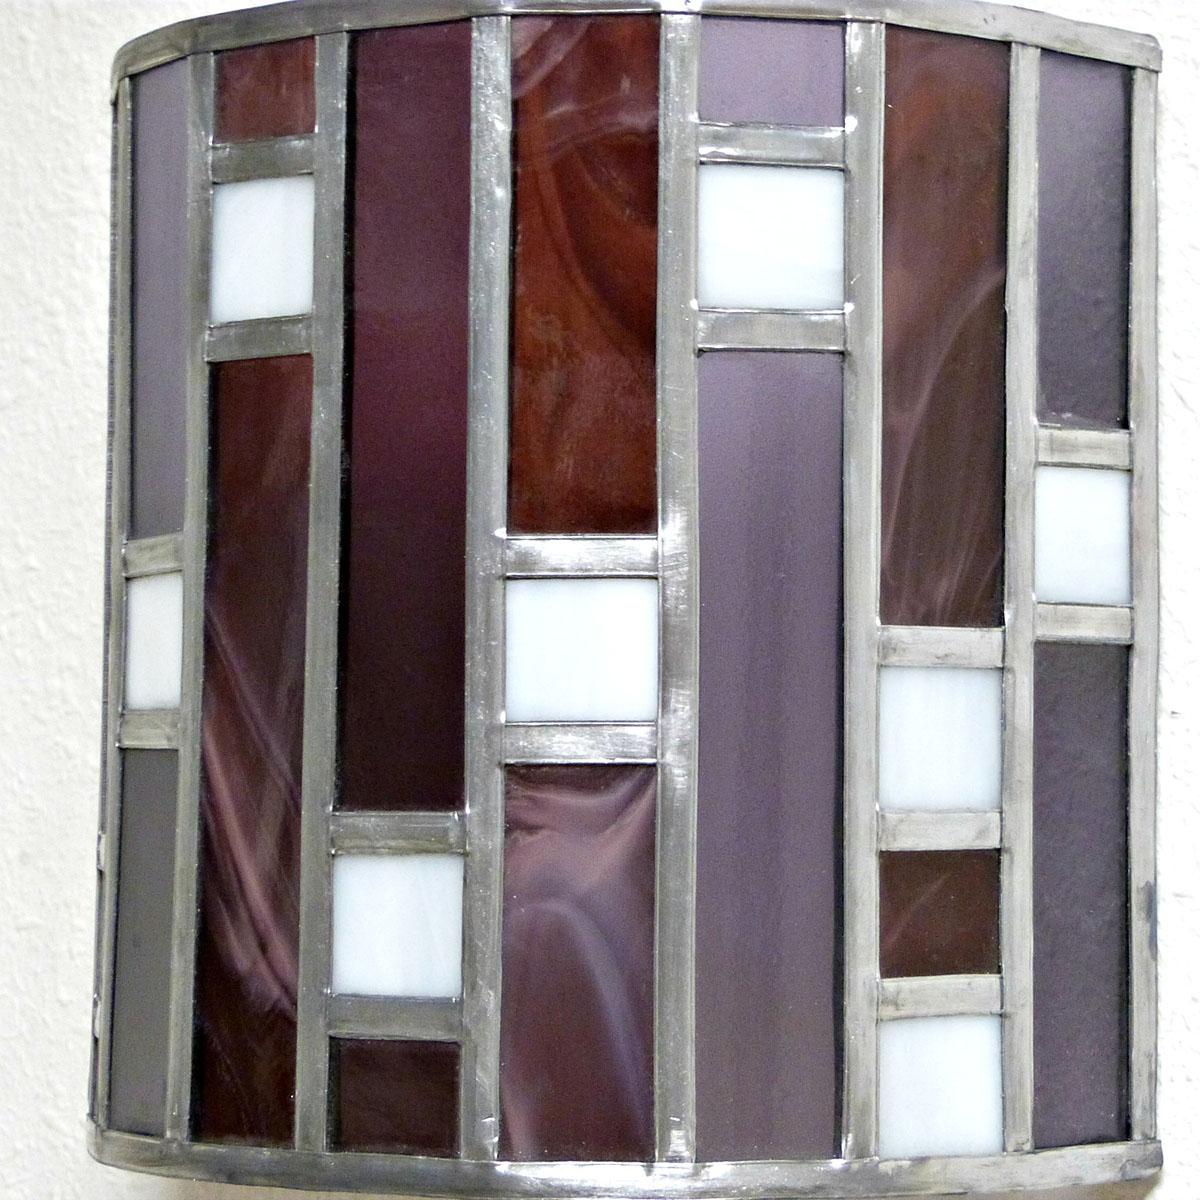 Applique murale vitrail art deco forme demi cylindre rose et violet 4 1